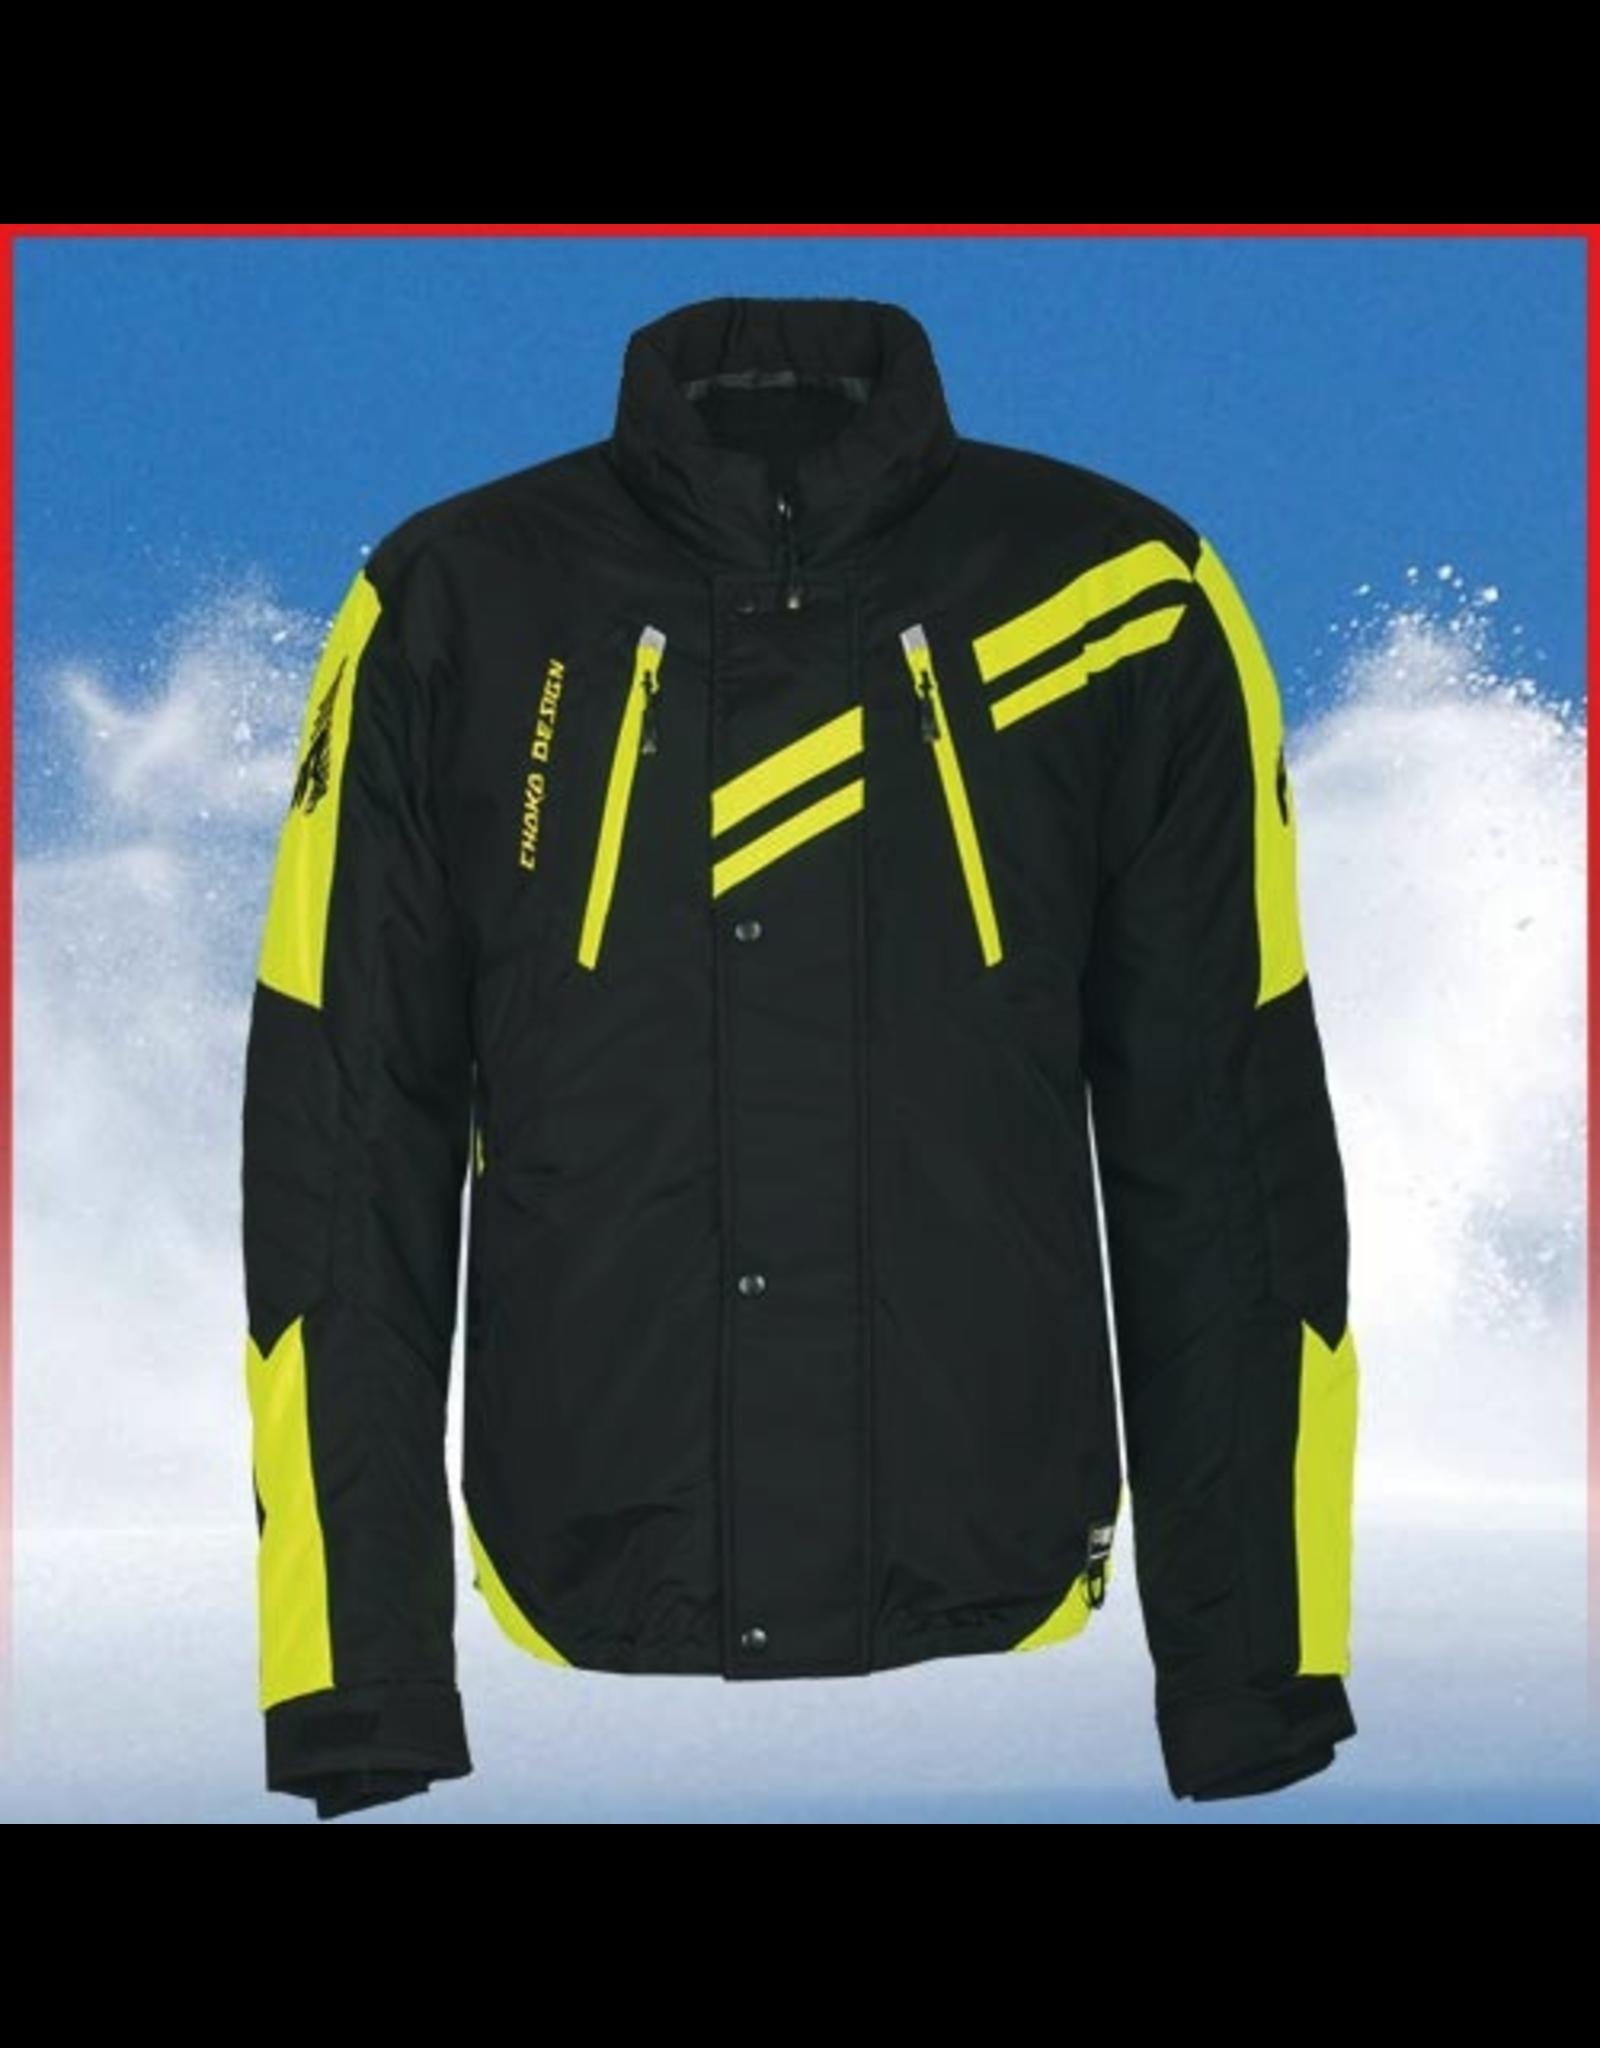 Choko Choko Unisex HR7 Racing Jacket